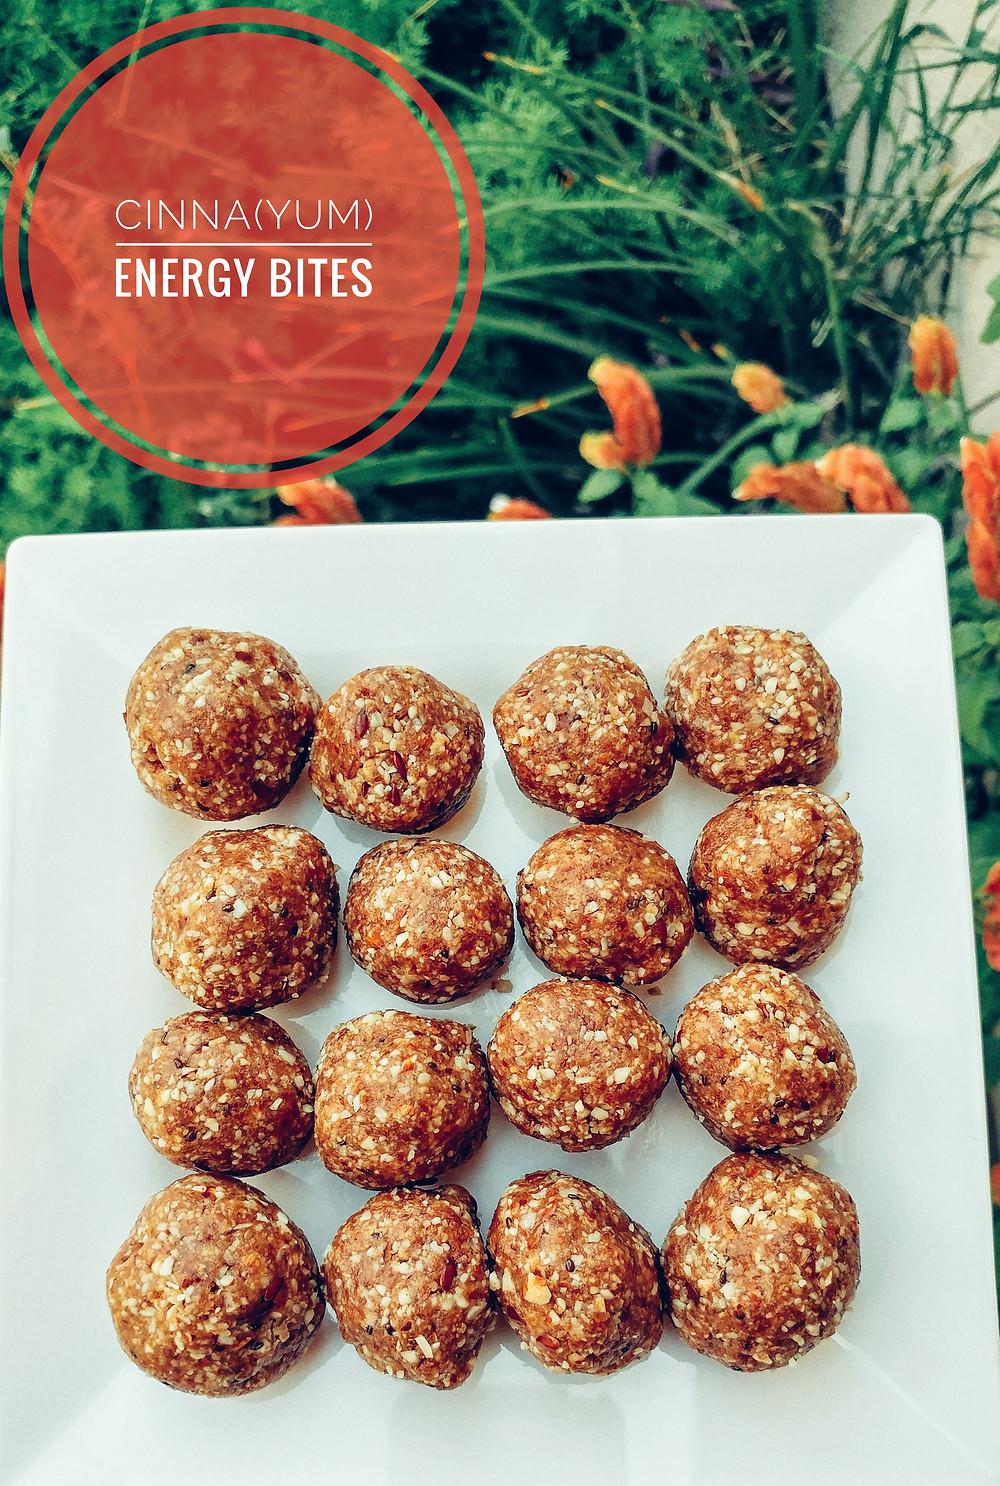 Cinna(yum) Energy Bites